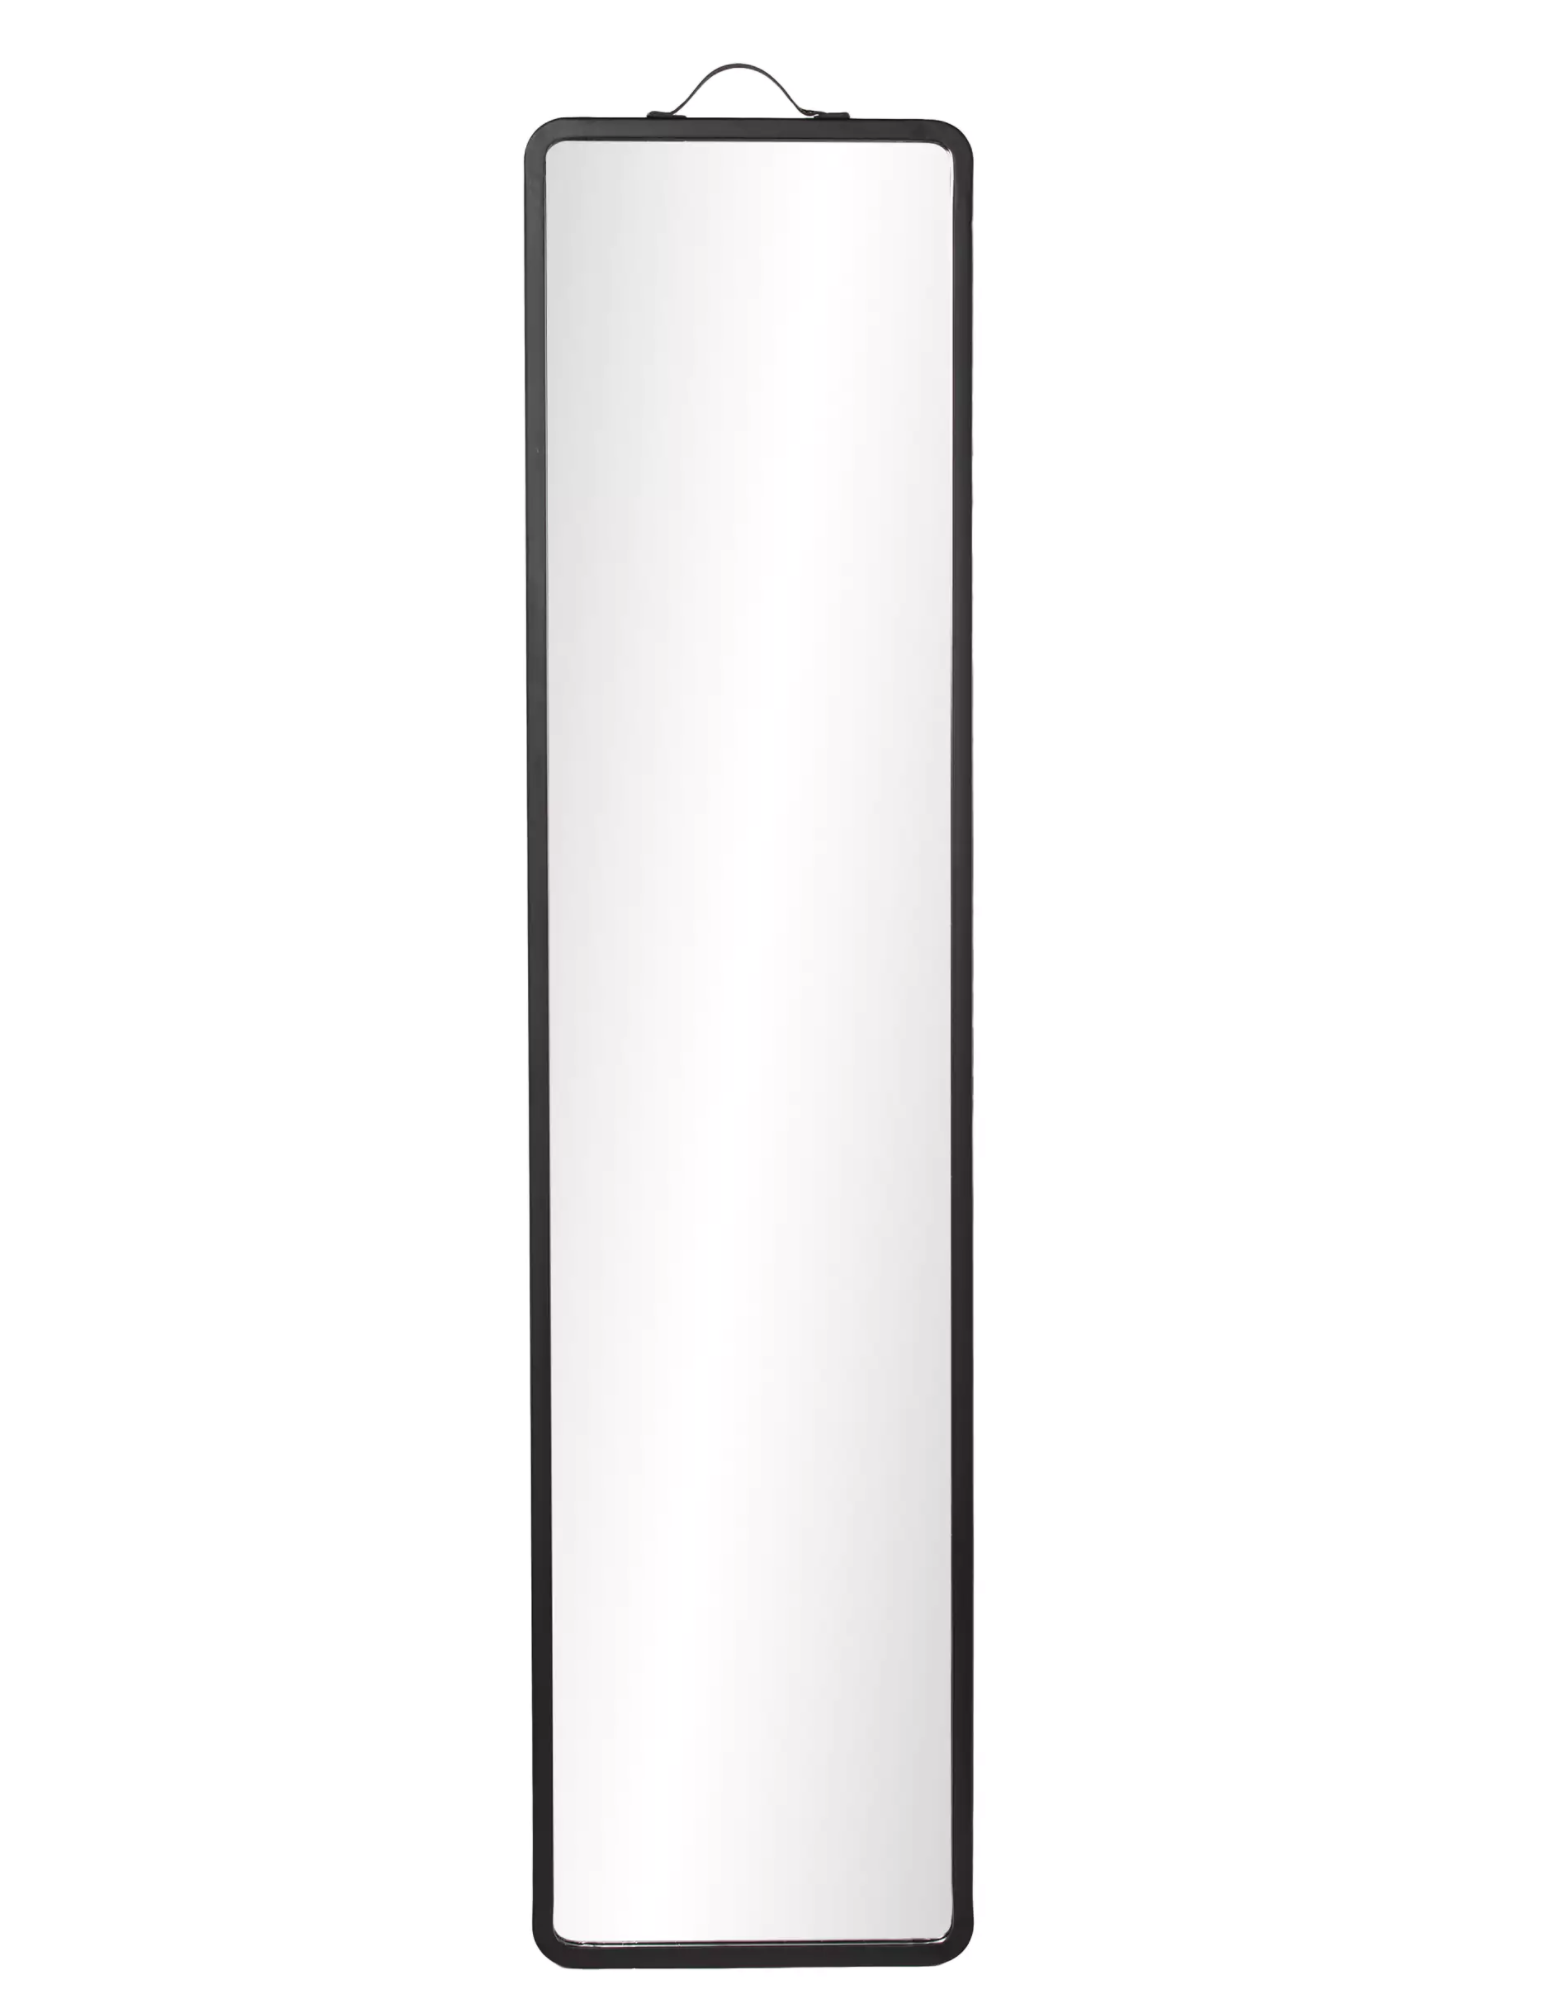 Holly & Martin Lawson Floor Leaning Full-Length Mirror